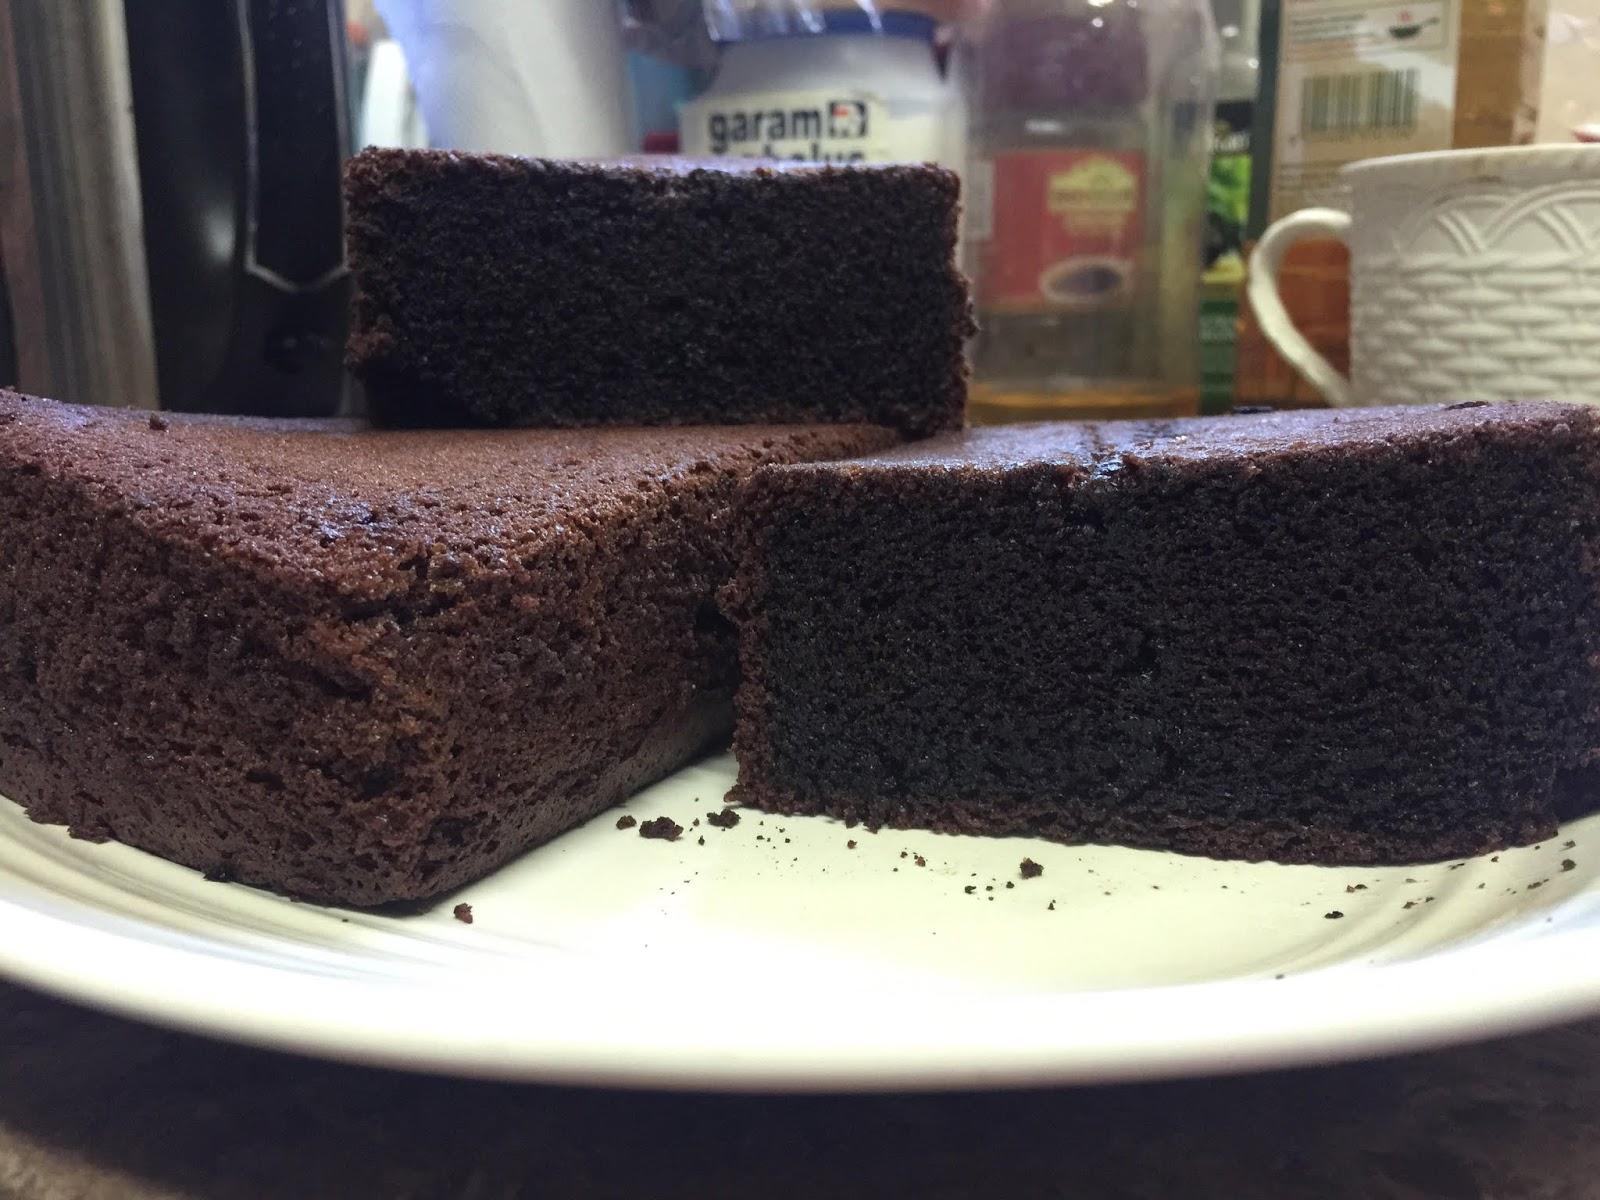 Resepi Paling Mudah Menyediakan Kek Coklat Moist Yang Sedap